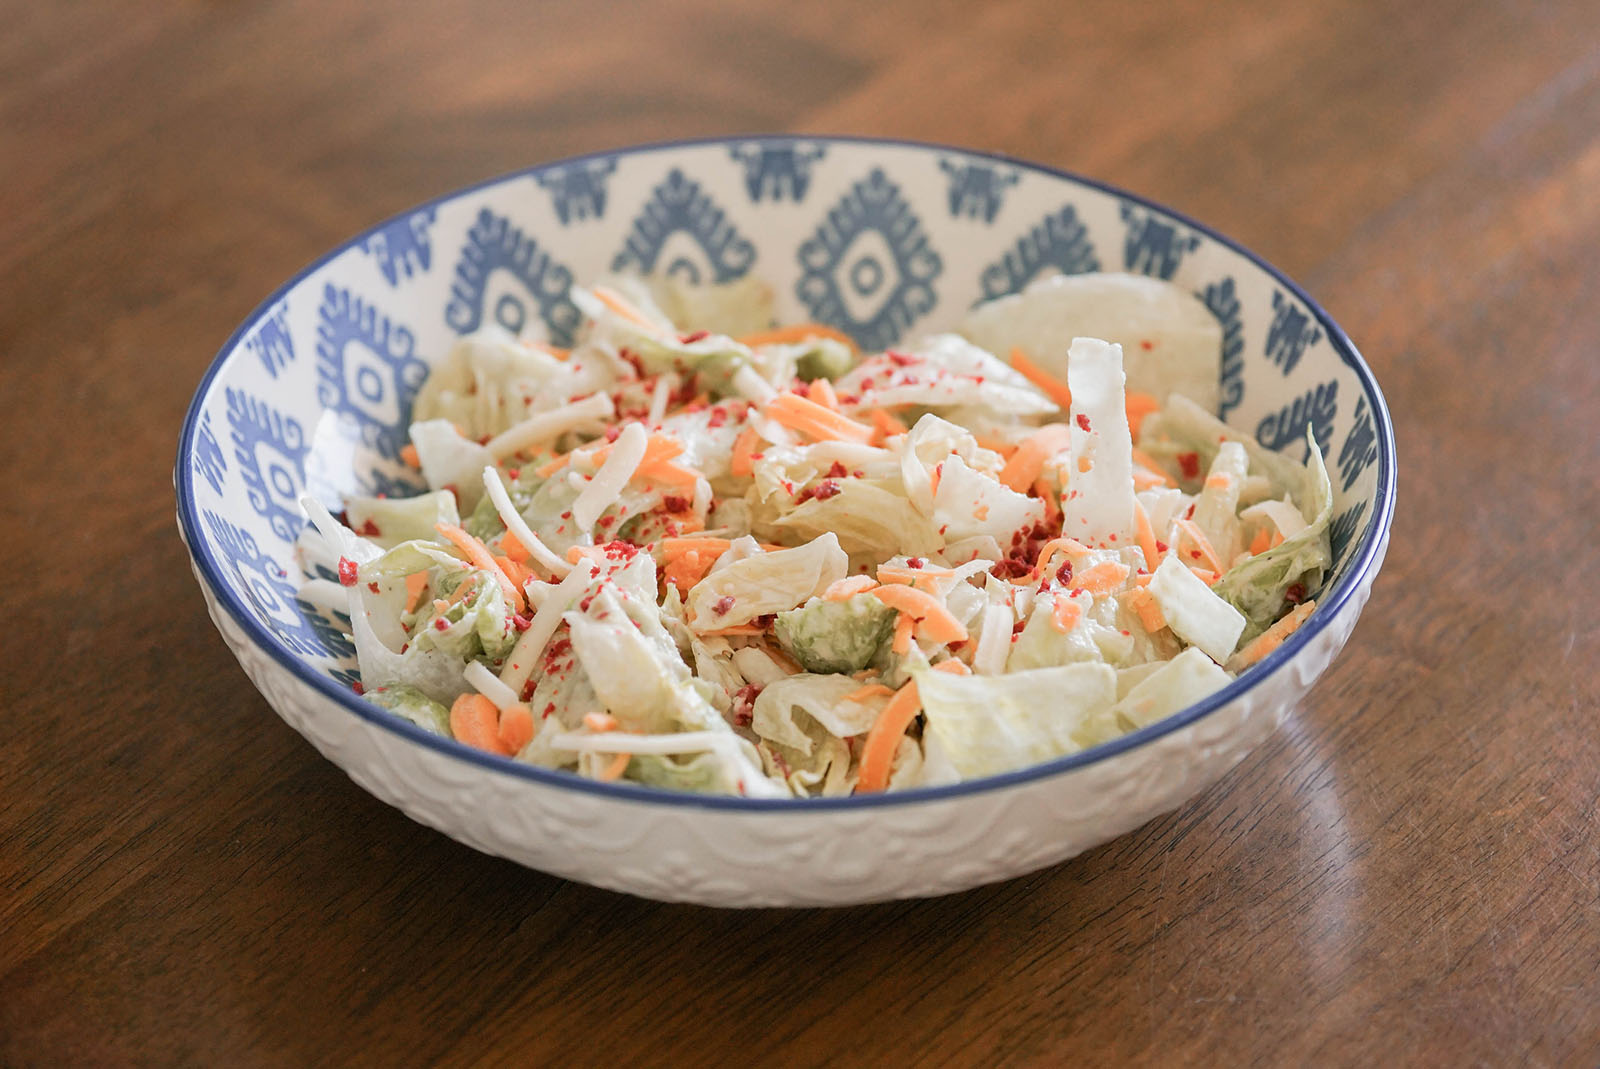 Cuisinart Cordless Food Chopper review 14